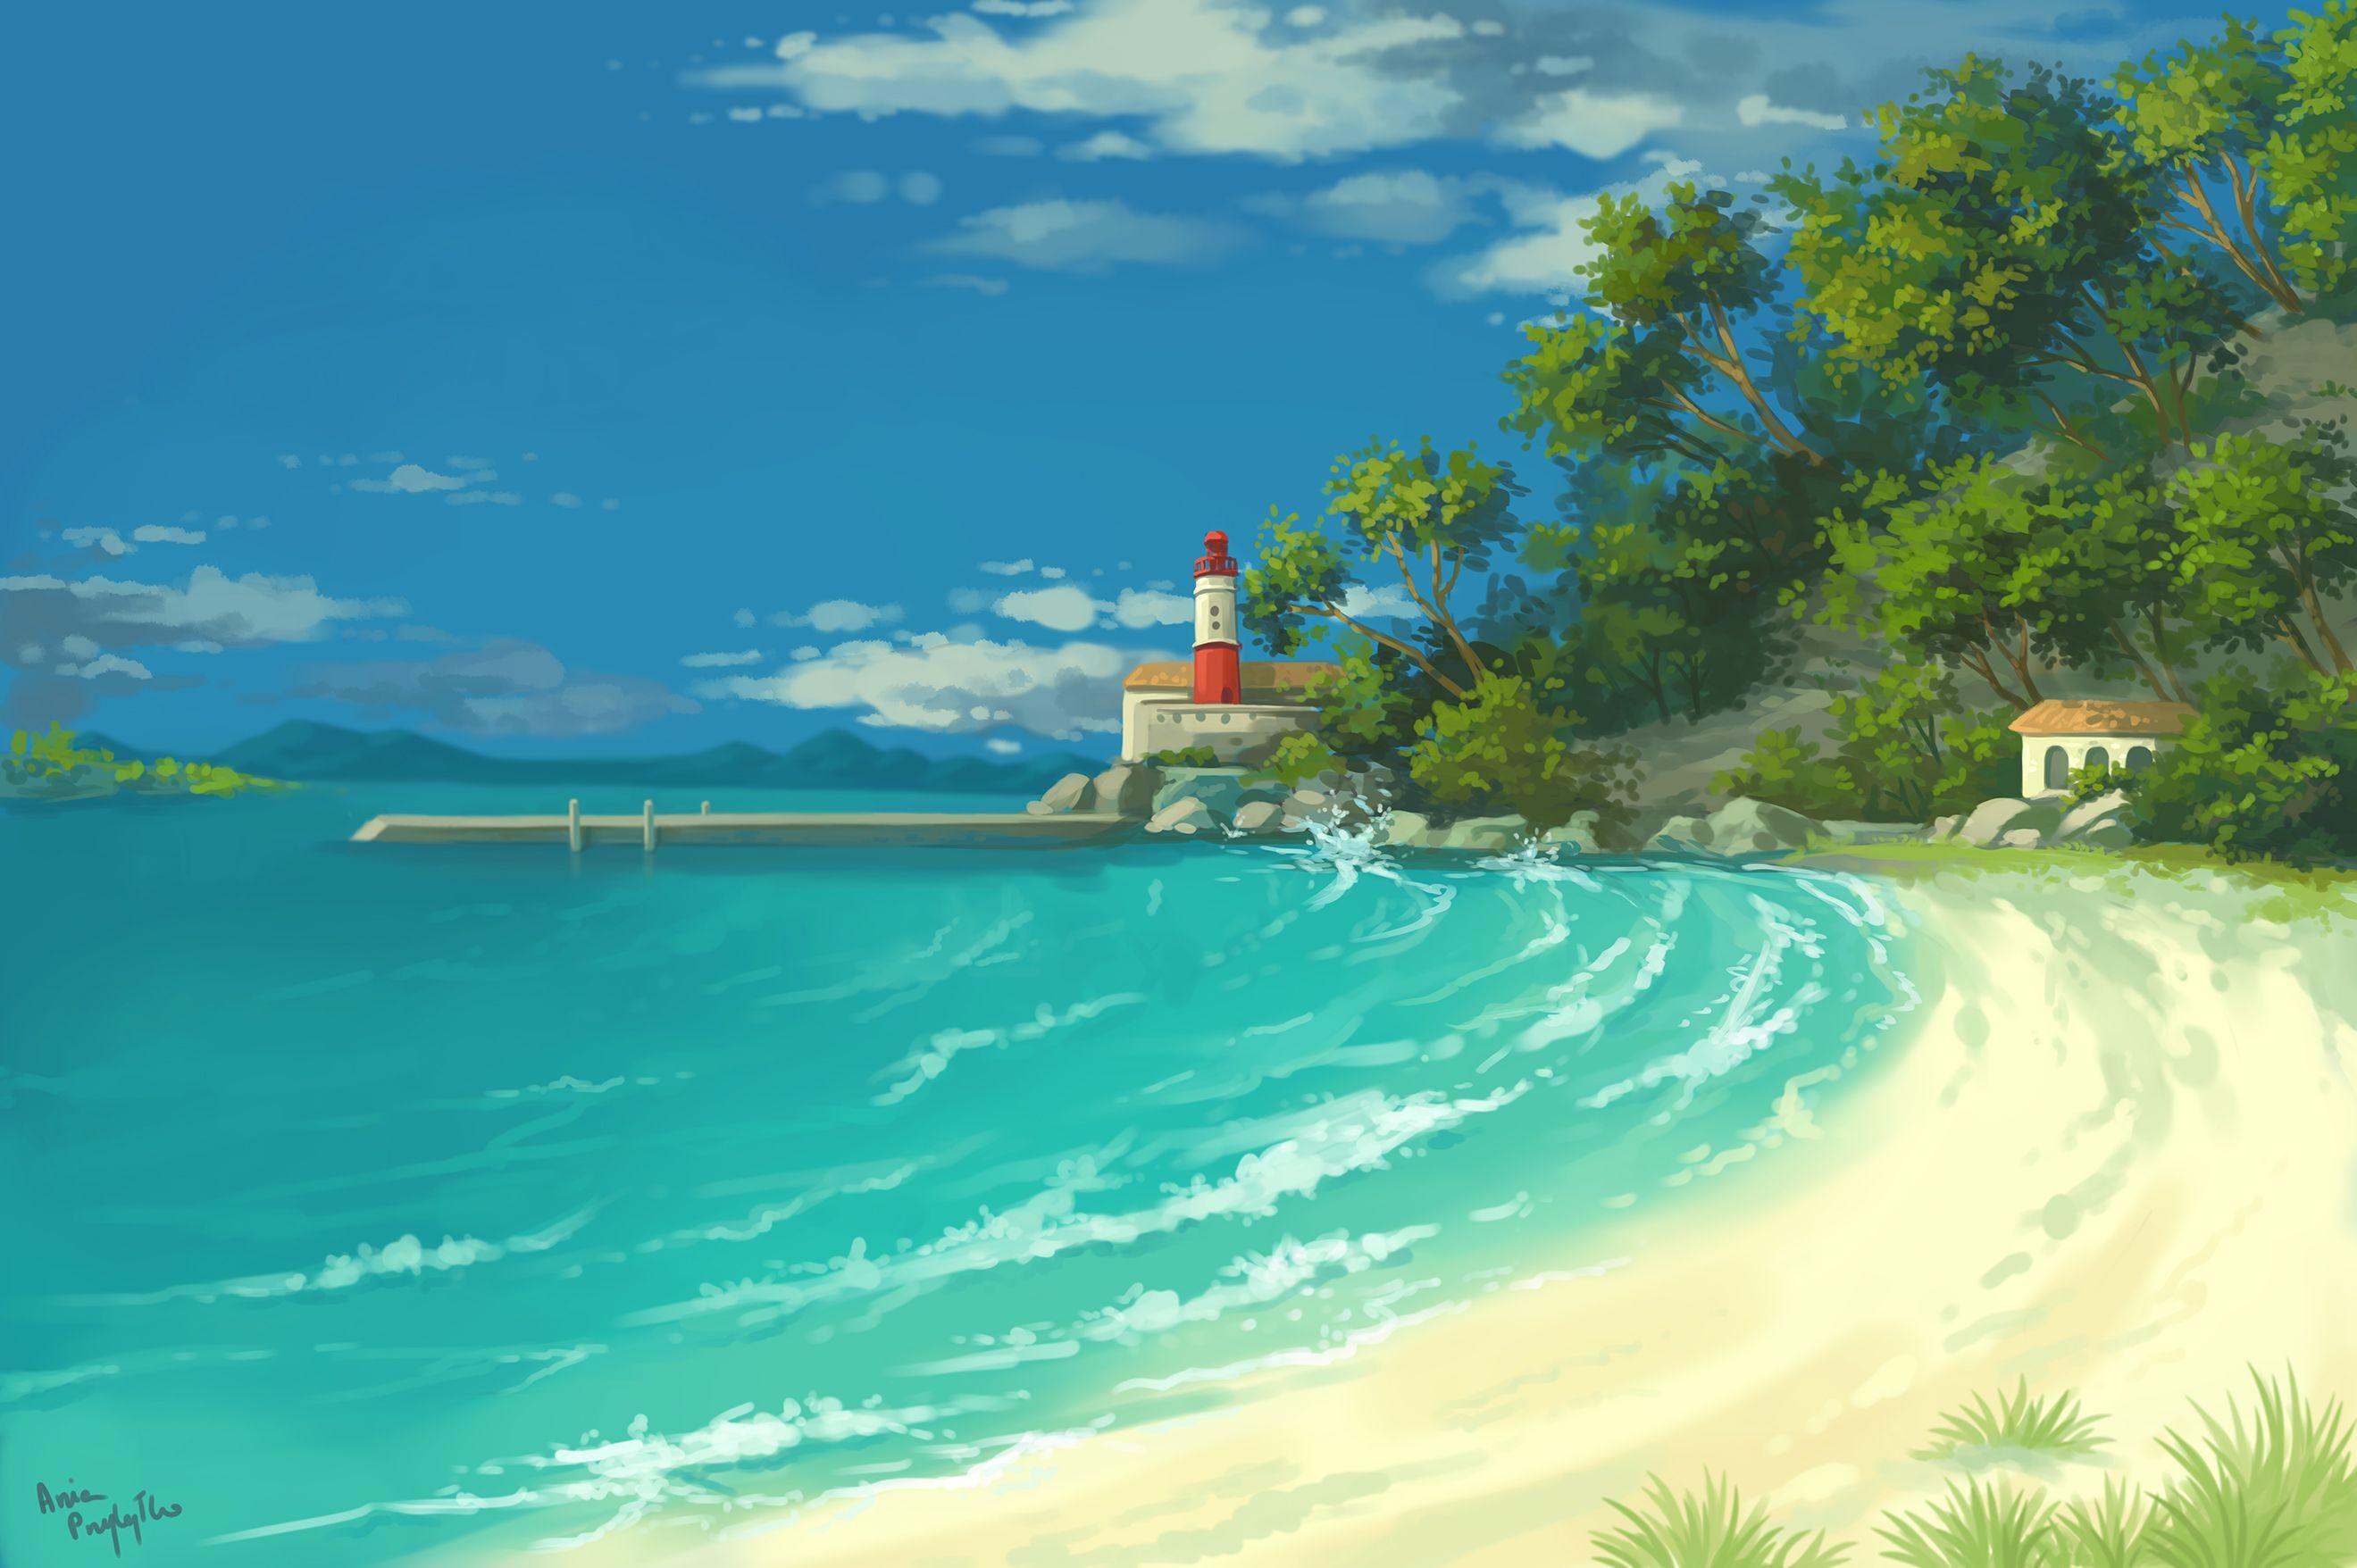 Coast Sea Background Landscape Scenery Ocean Lighthouse Digital Photoshop Illustration 2d Painting